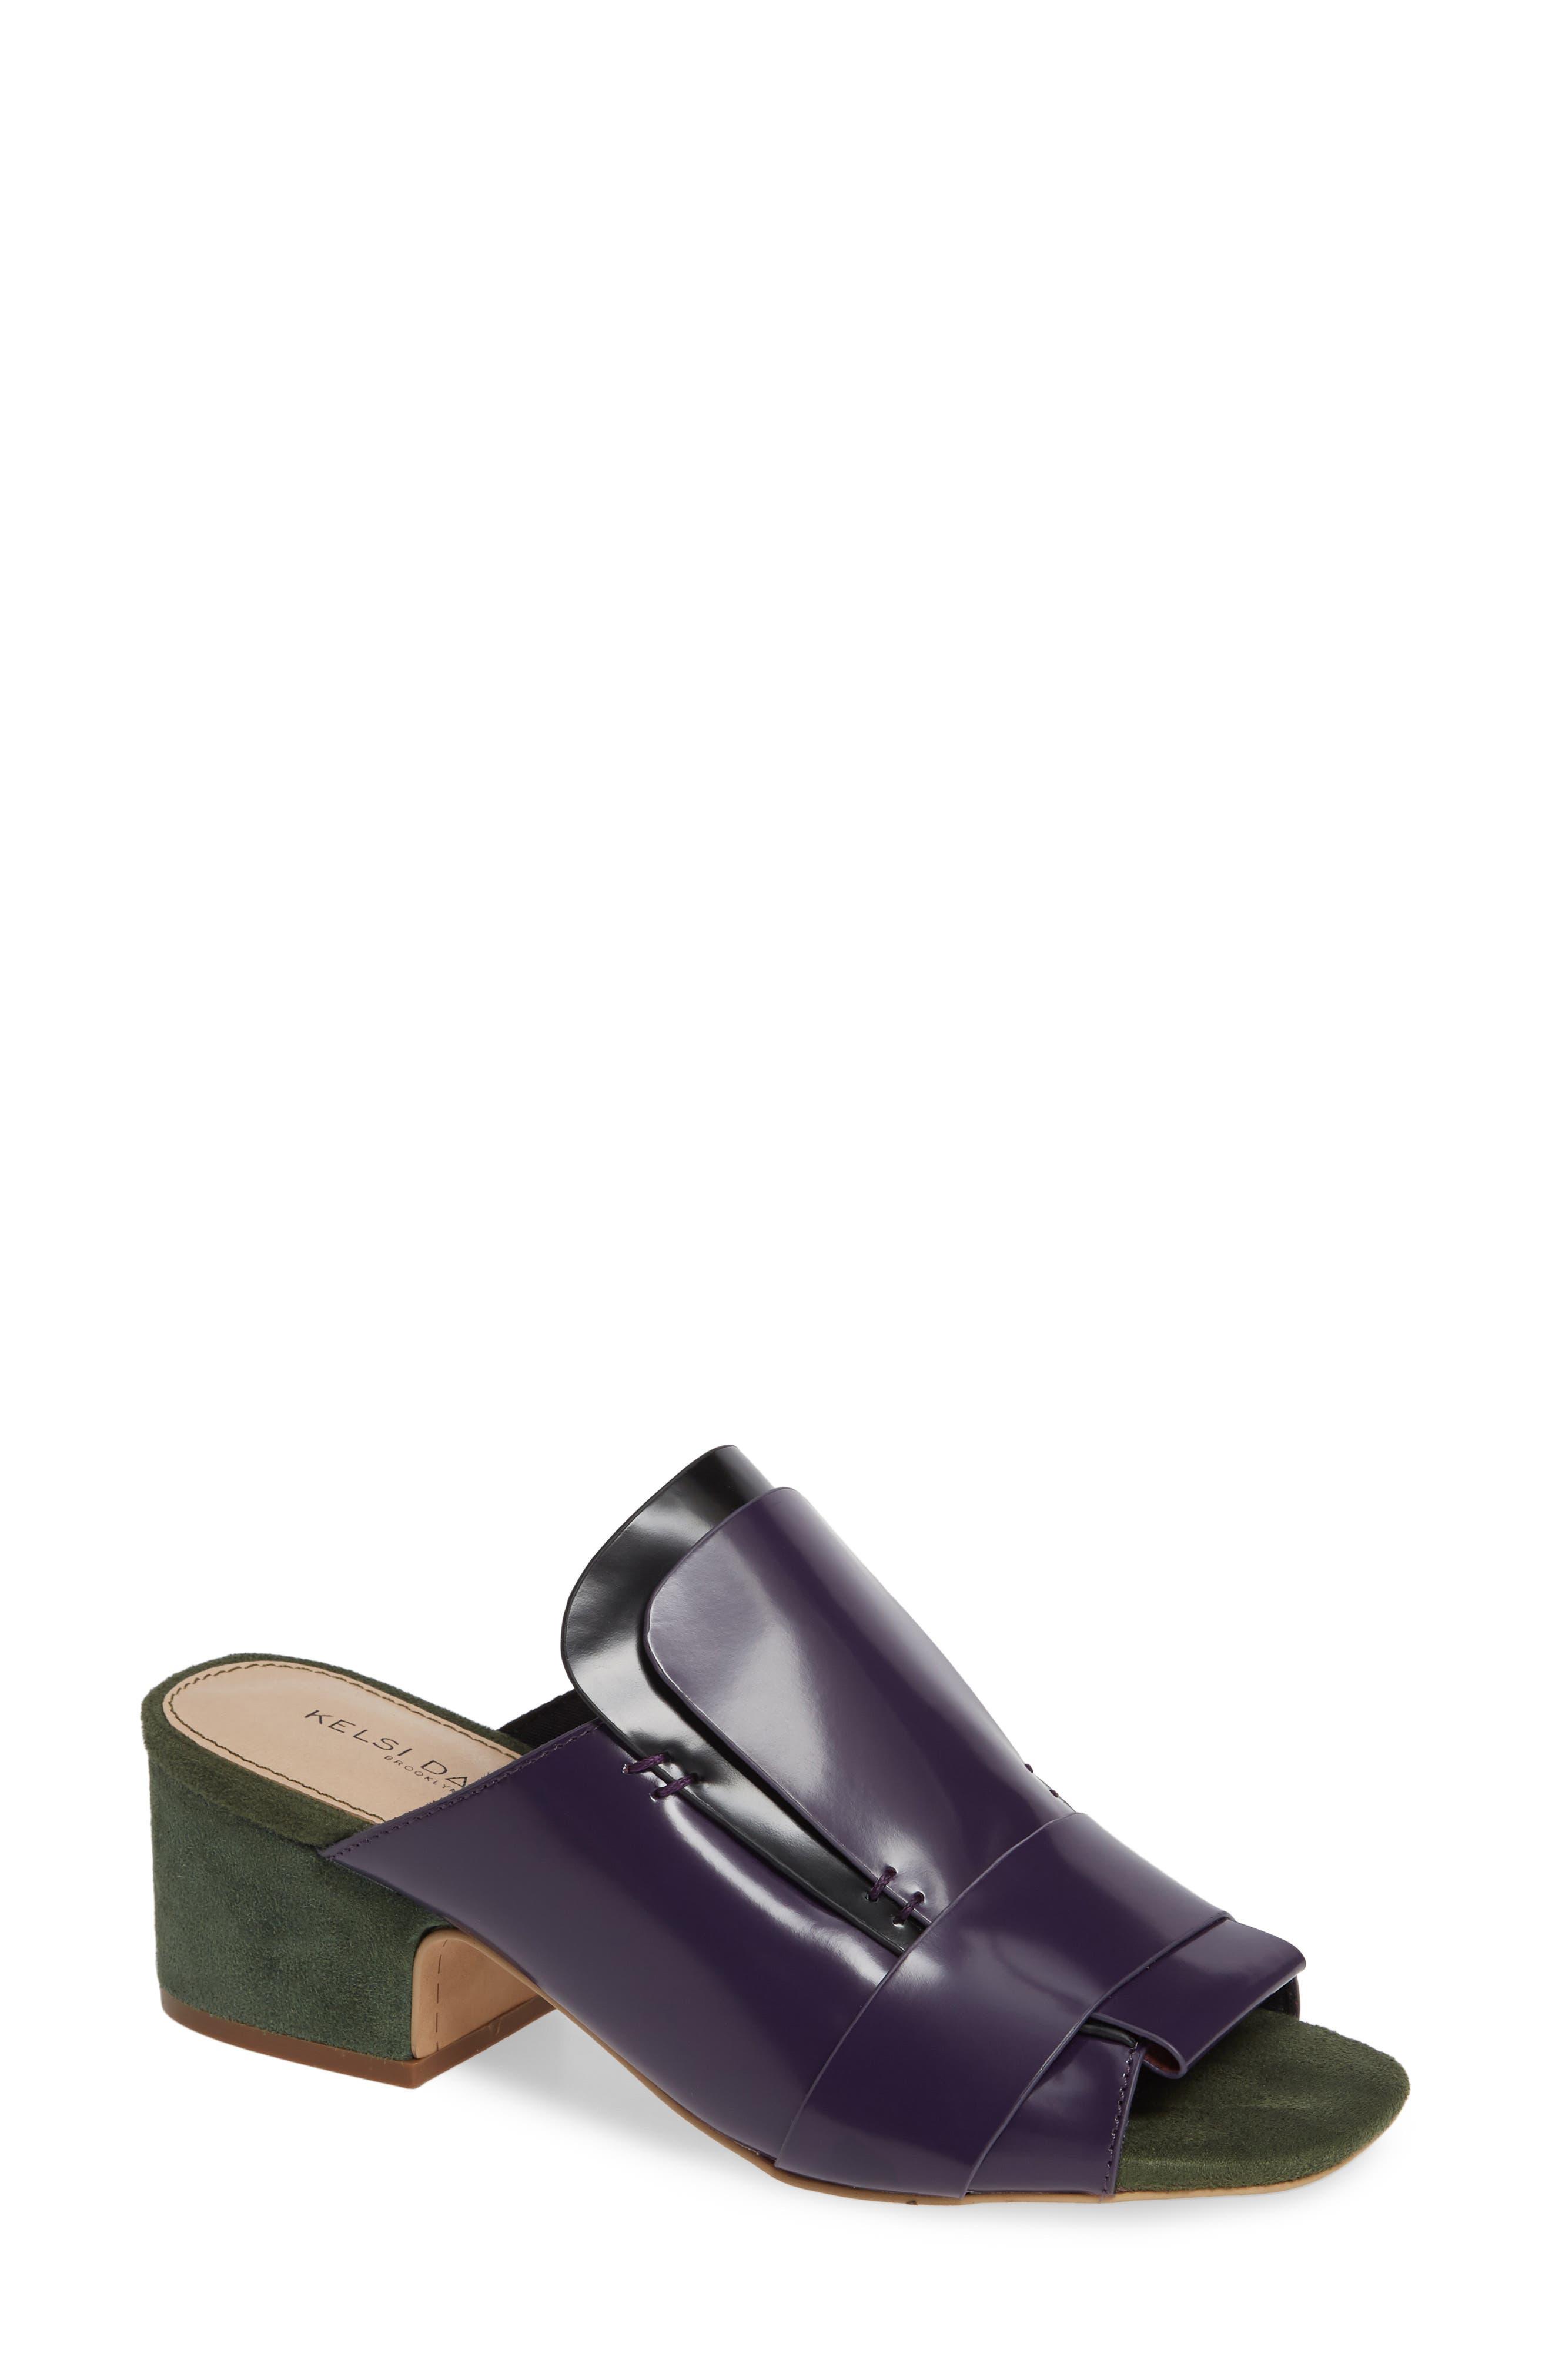 Kelsi Dagger Brooklyn Sadie Loafer Slide Sandal, Purple